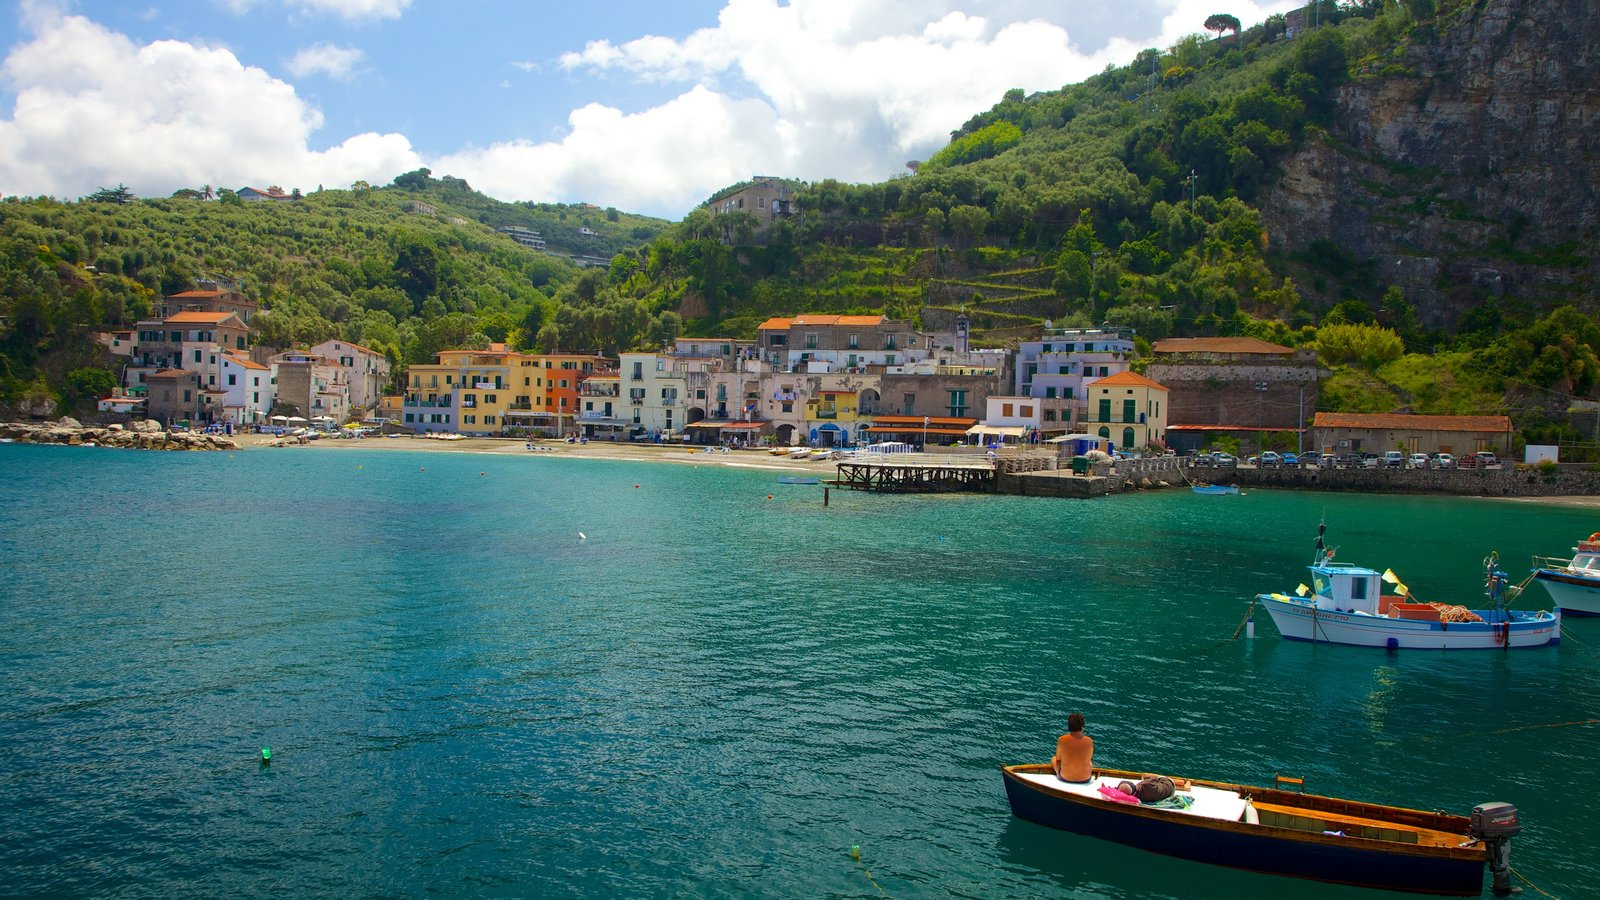 Marina di Puolo which includes landscape views, boating and a marina